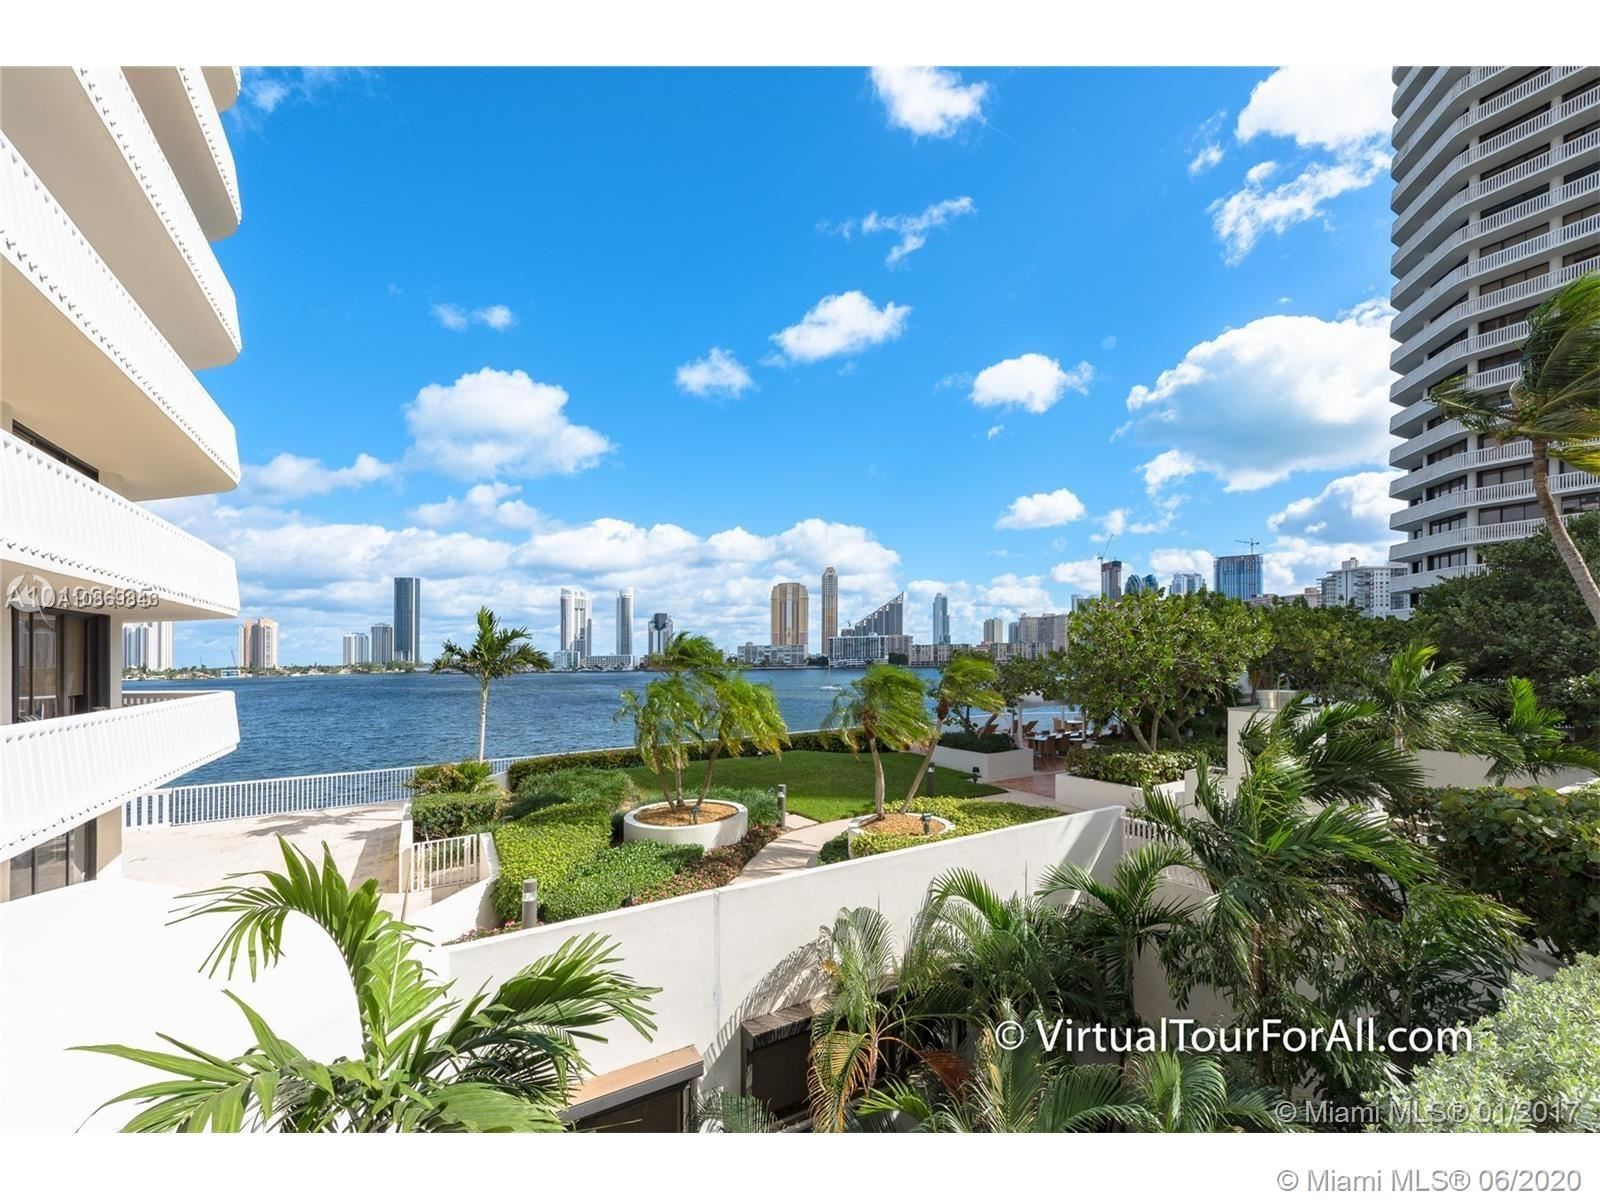 3000 Island Blvd #501, Aventura, FL 33160 - #: A10869843